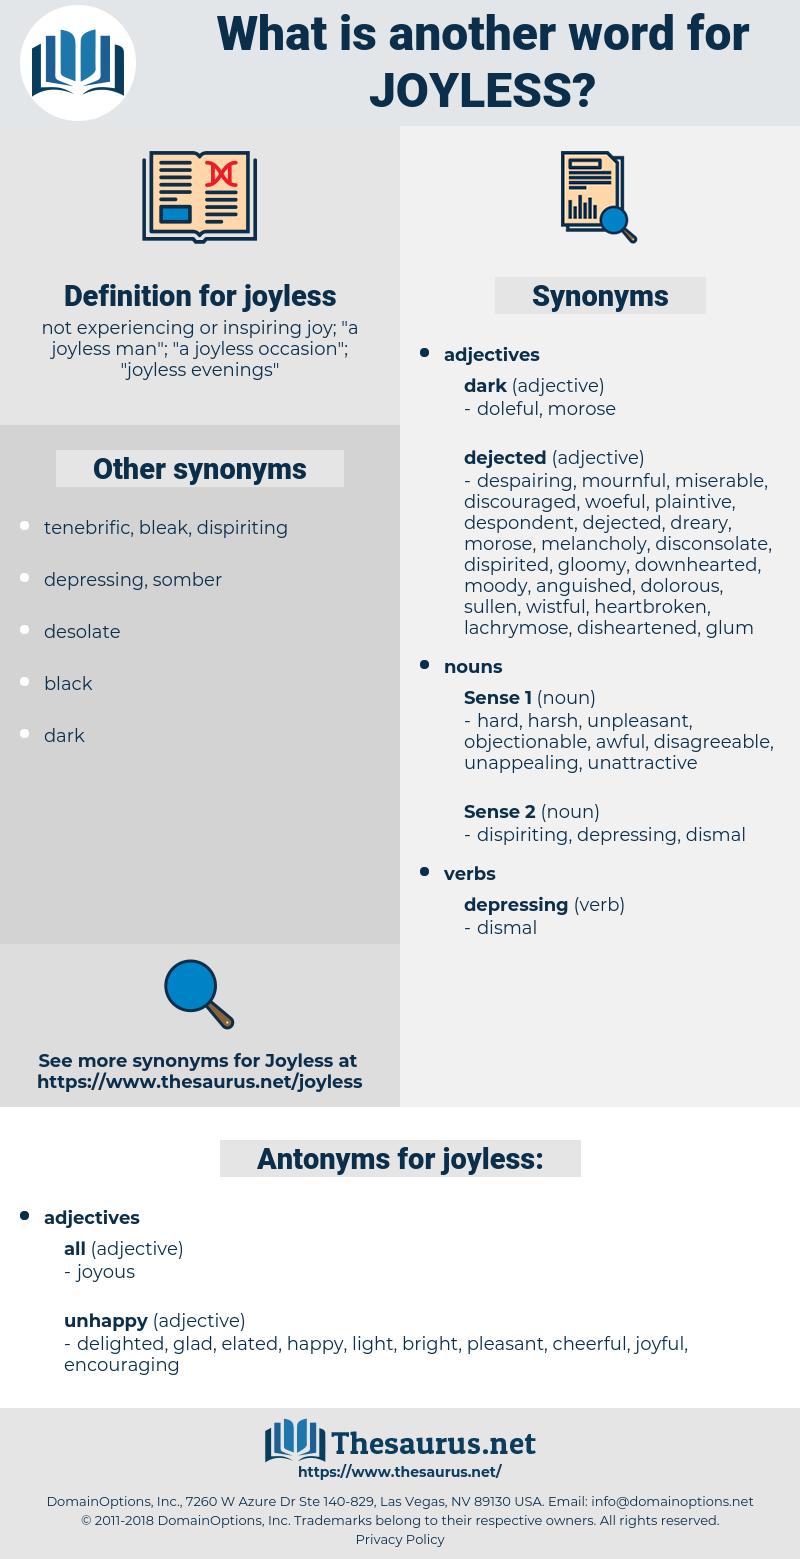 joyless, synonym joyless, another word for joyless, words like joyless, thesaurus joyless